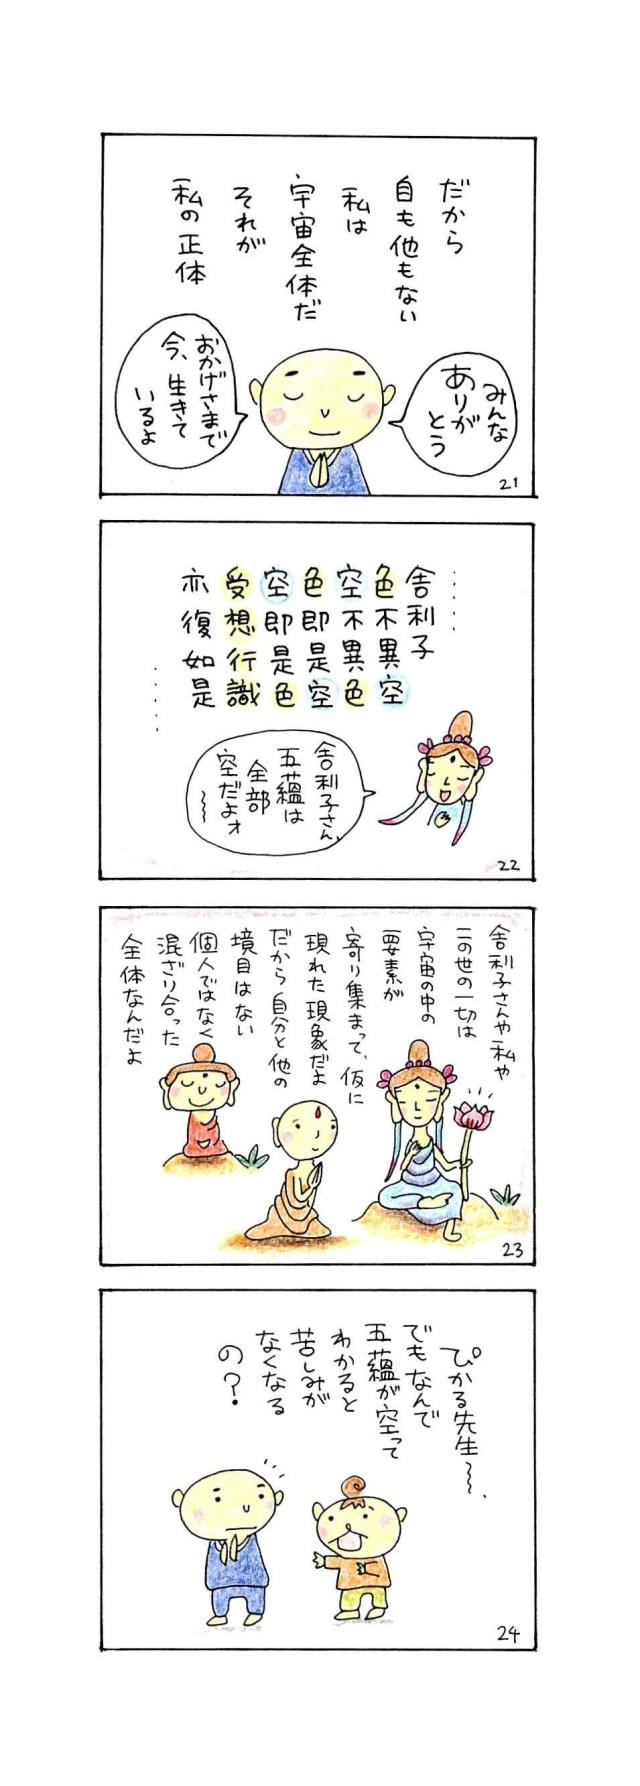 般若心経「五蘊と空」p21-p24